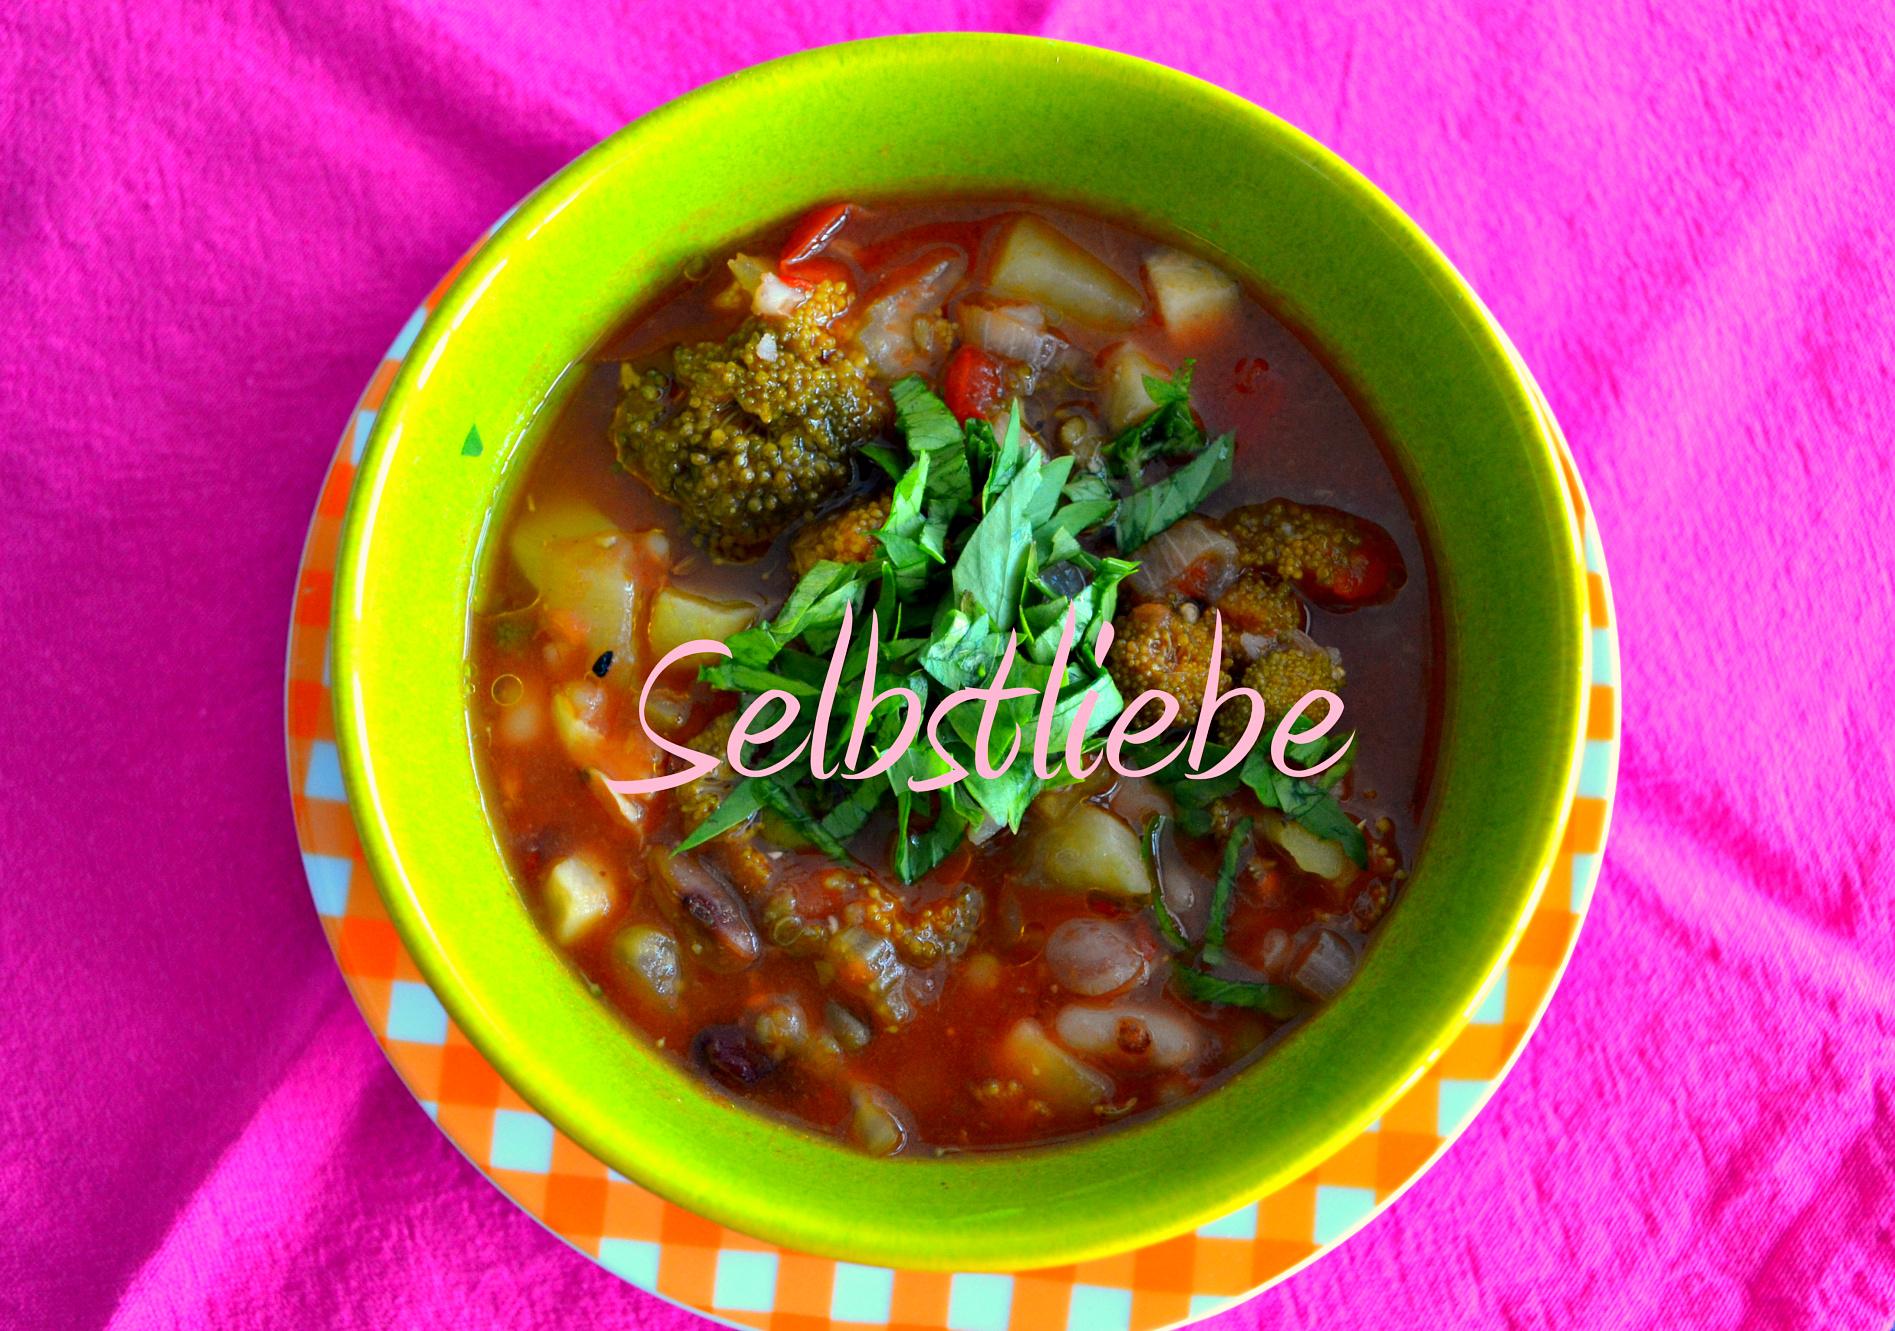 Suppe Selbstliebe II